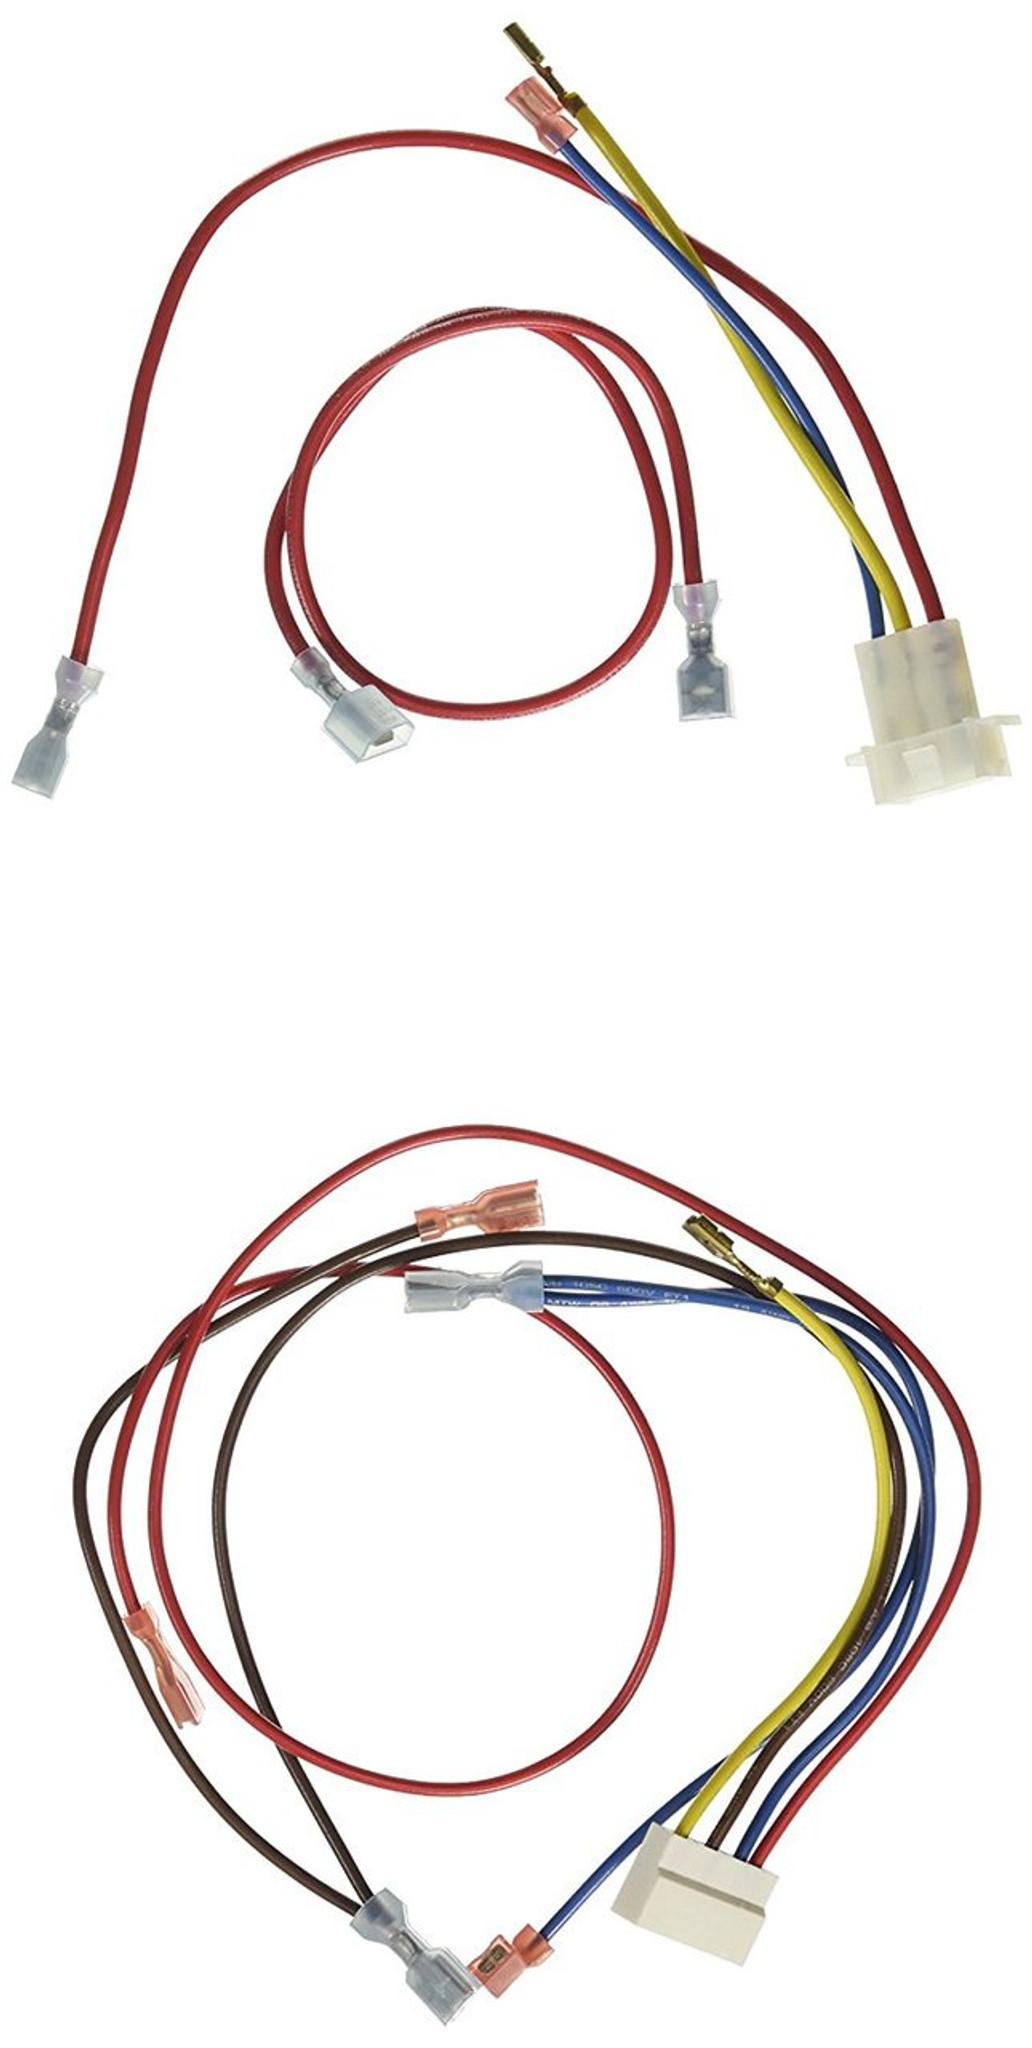 suburban furnace wiring harness 520839 nt series suburban rv parts suburban rv furnace wiring harness [ 1032 x 2048 Pixel ]